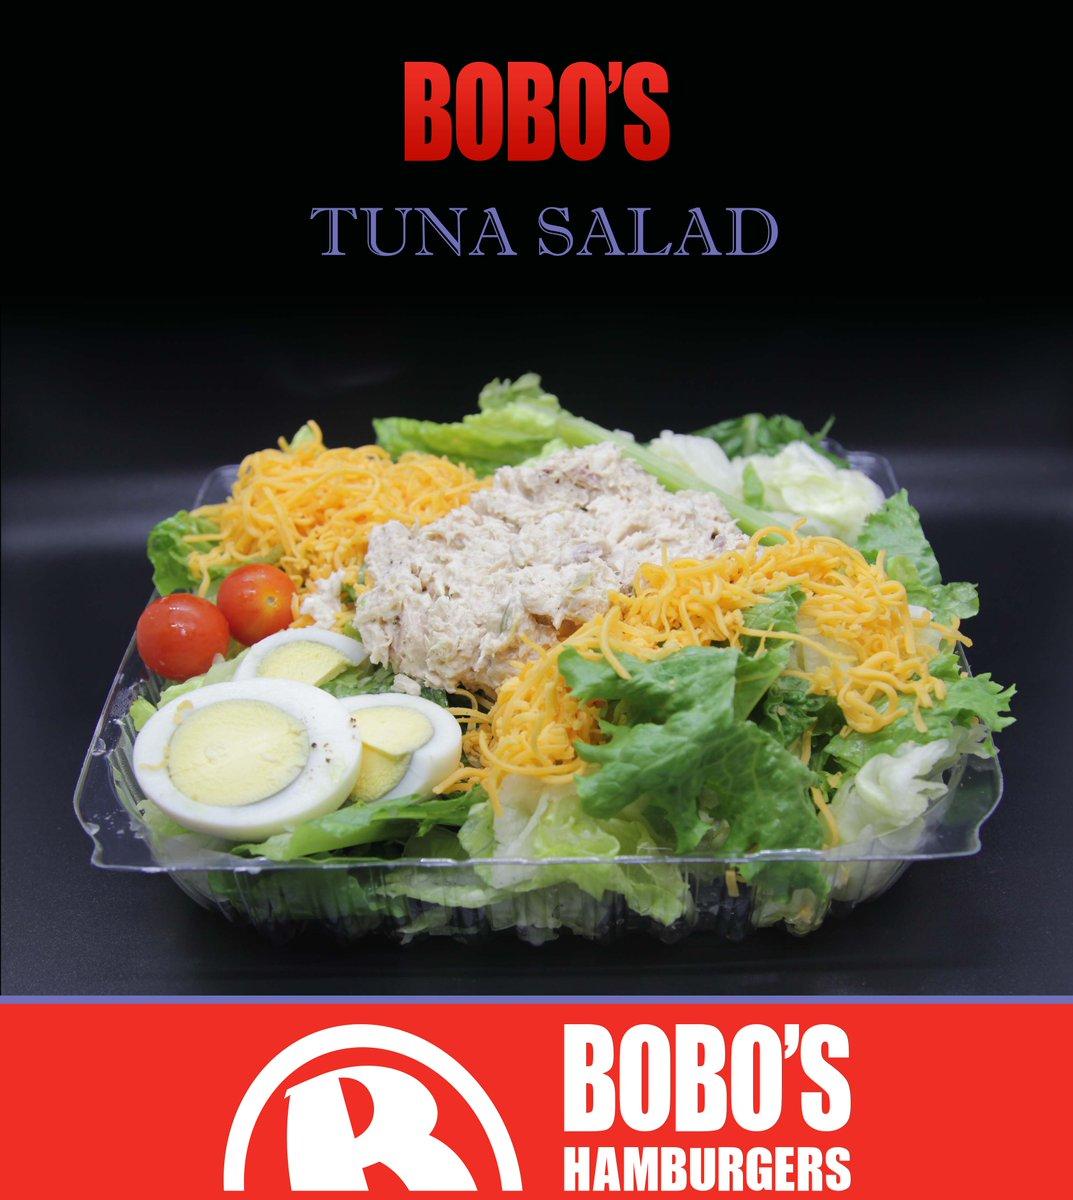 Your New Year Resolution has arrived, BOBO's Tuna Salad! Health food done right. Leafy greens, eggs, cheese, tomatoes and fresh tuna. #salad #tuna #tunasalad  #HealthyEating #healthyliving #boboslosangeles #boboslynwood #bobospacoima #bobossouthgate #boboshuntingtonpark https://t.co/tEantkvToF